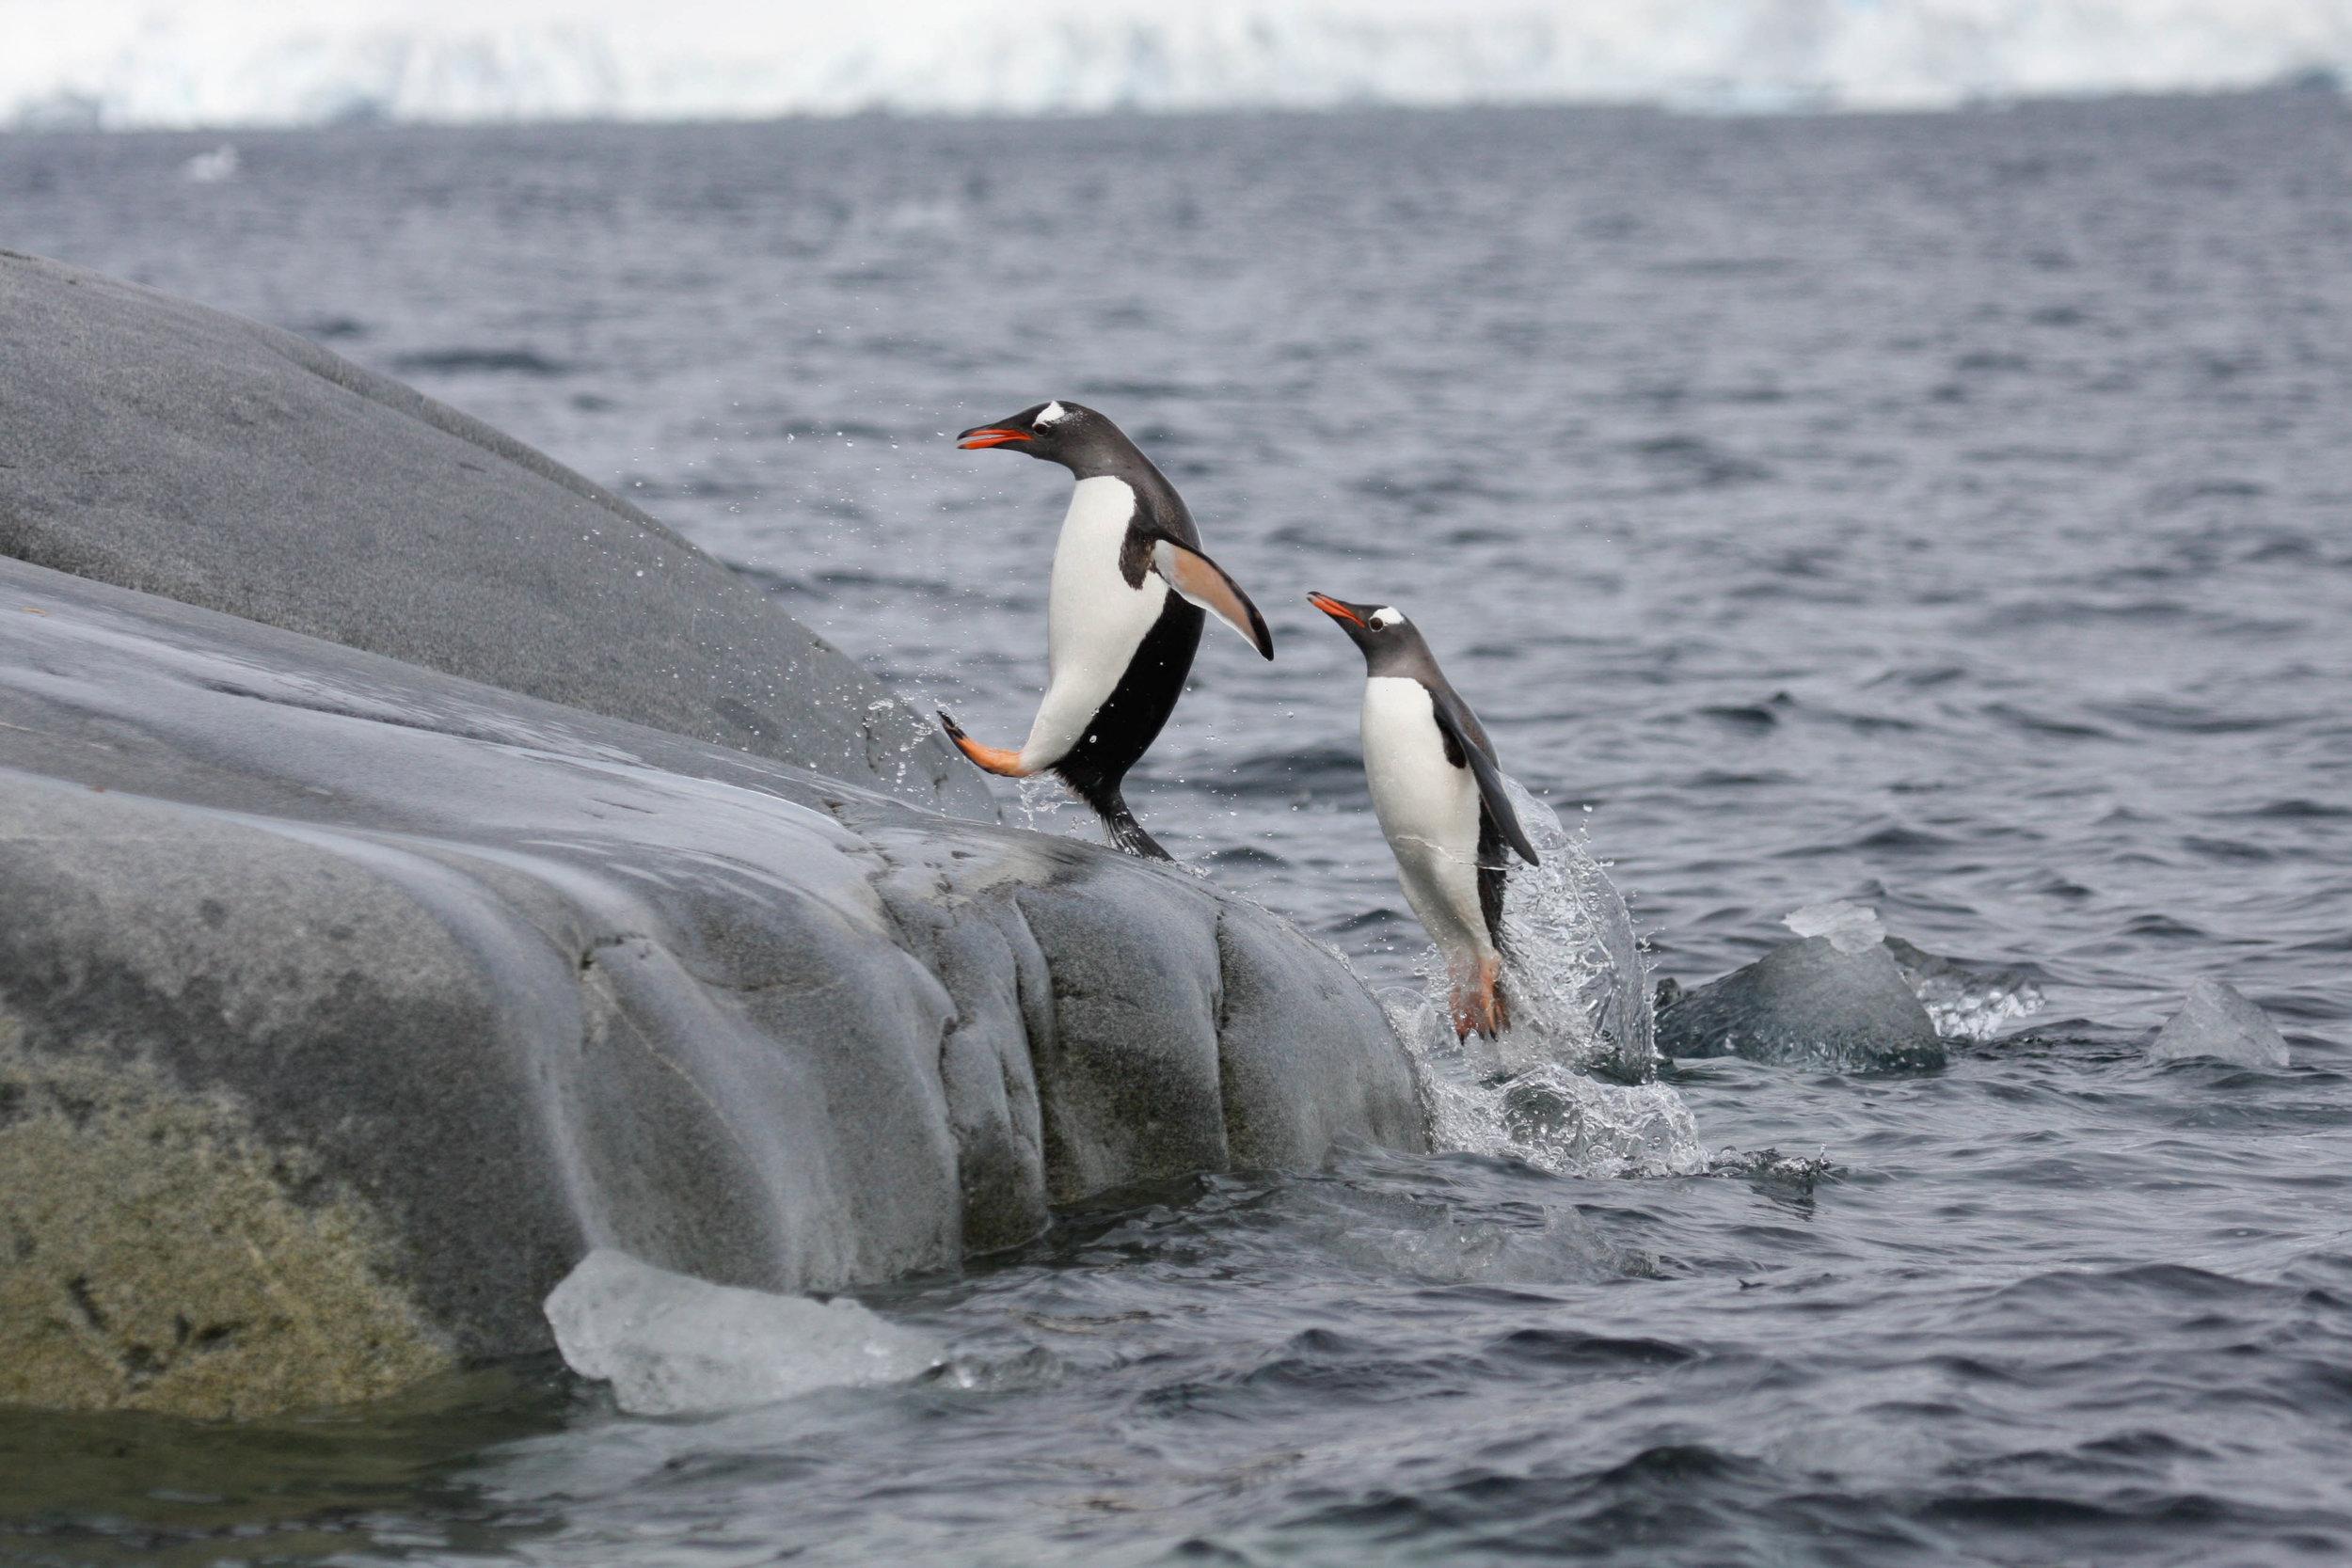 Gentoo penguins return from feeding - South Shetland Islands